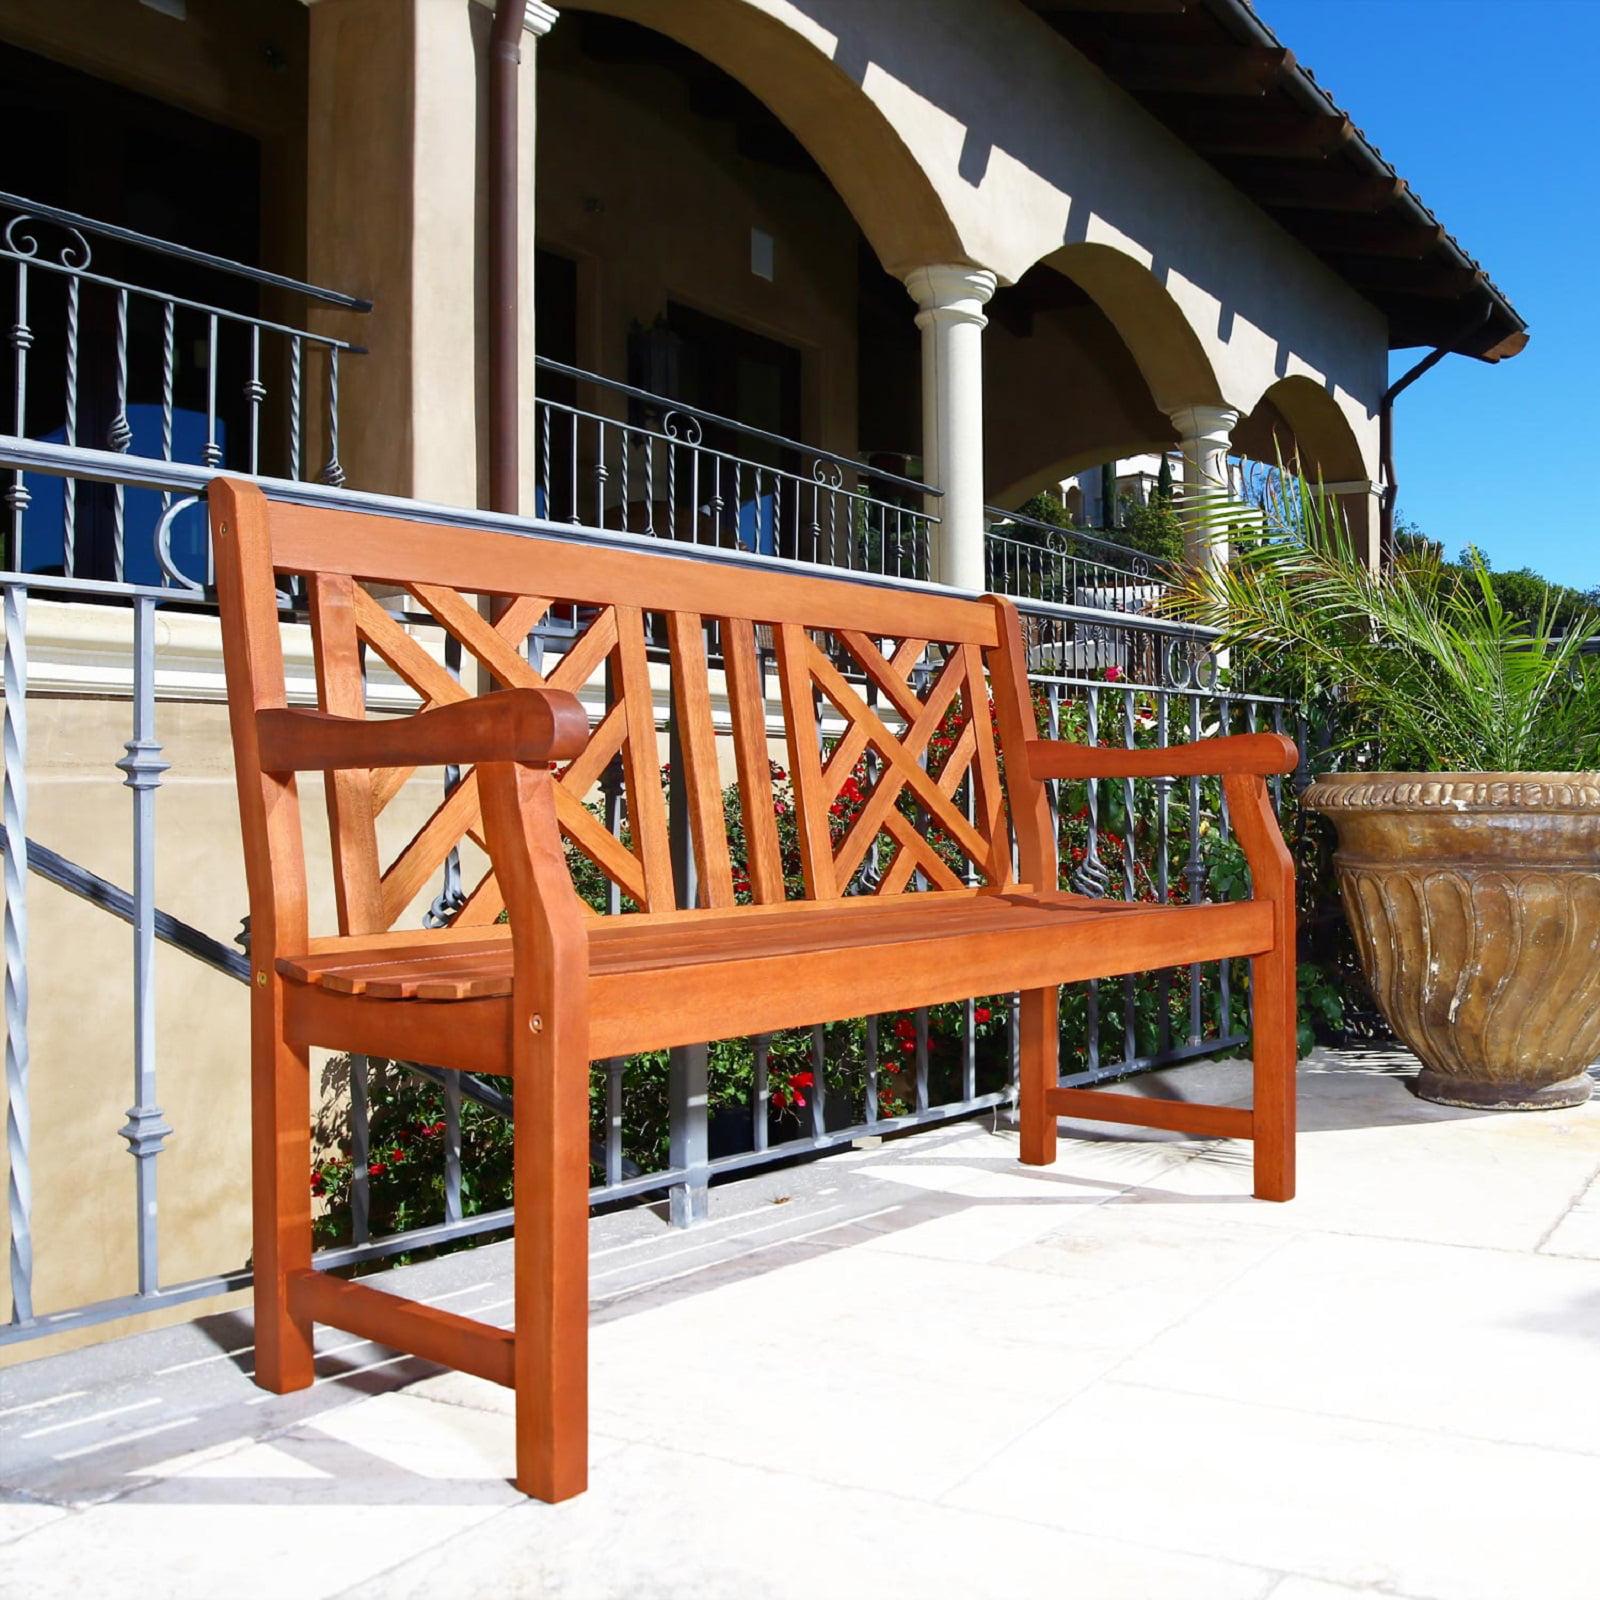 Malibu Outdoor Patio 4-foot Wood Garden Bench